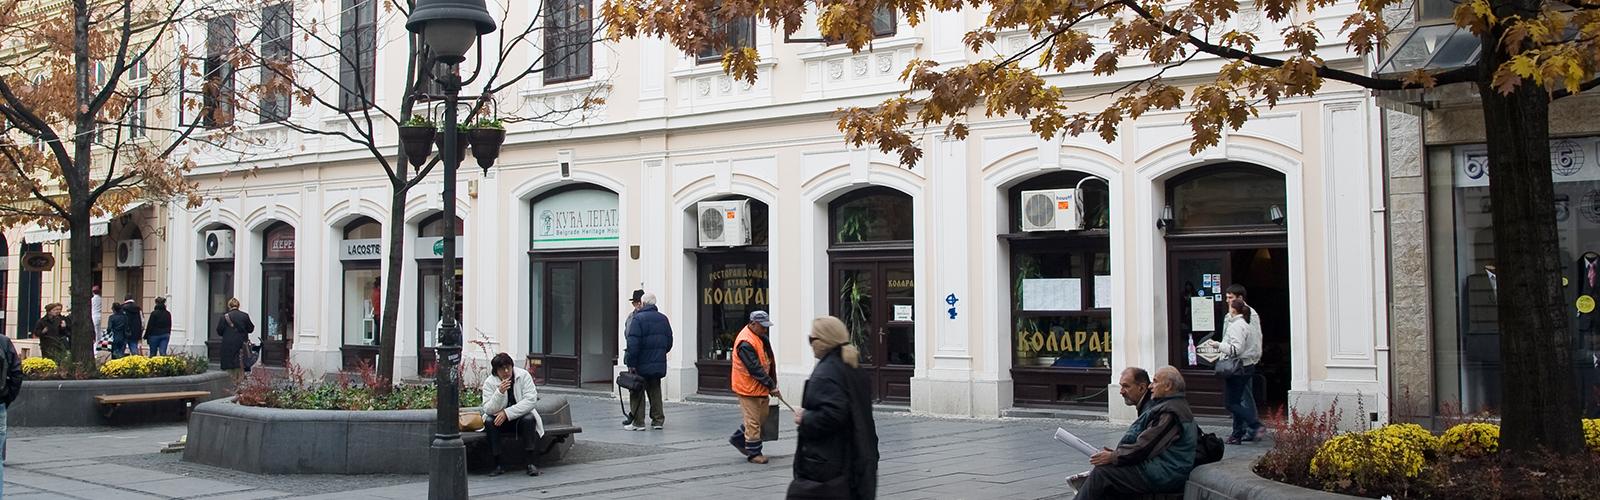 Concierge Belgrade   Kuća legata